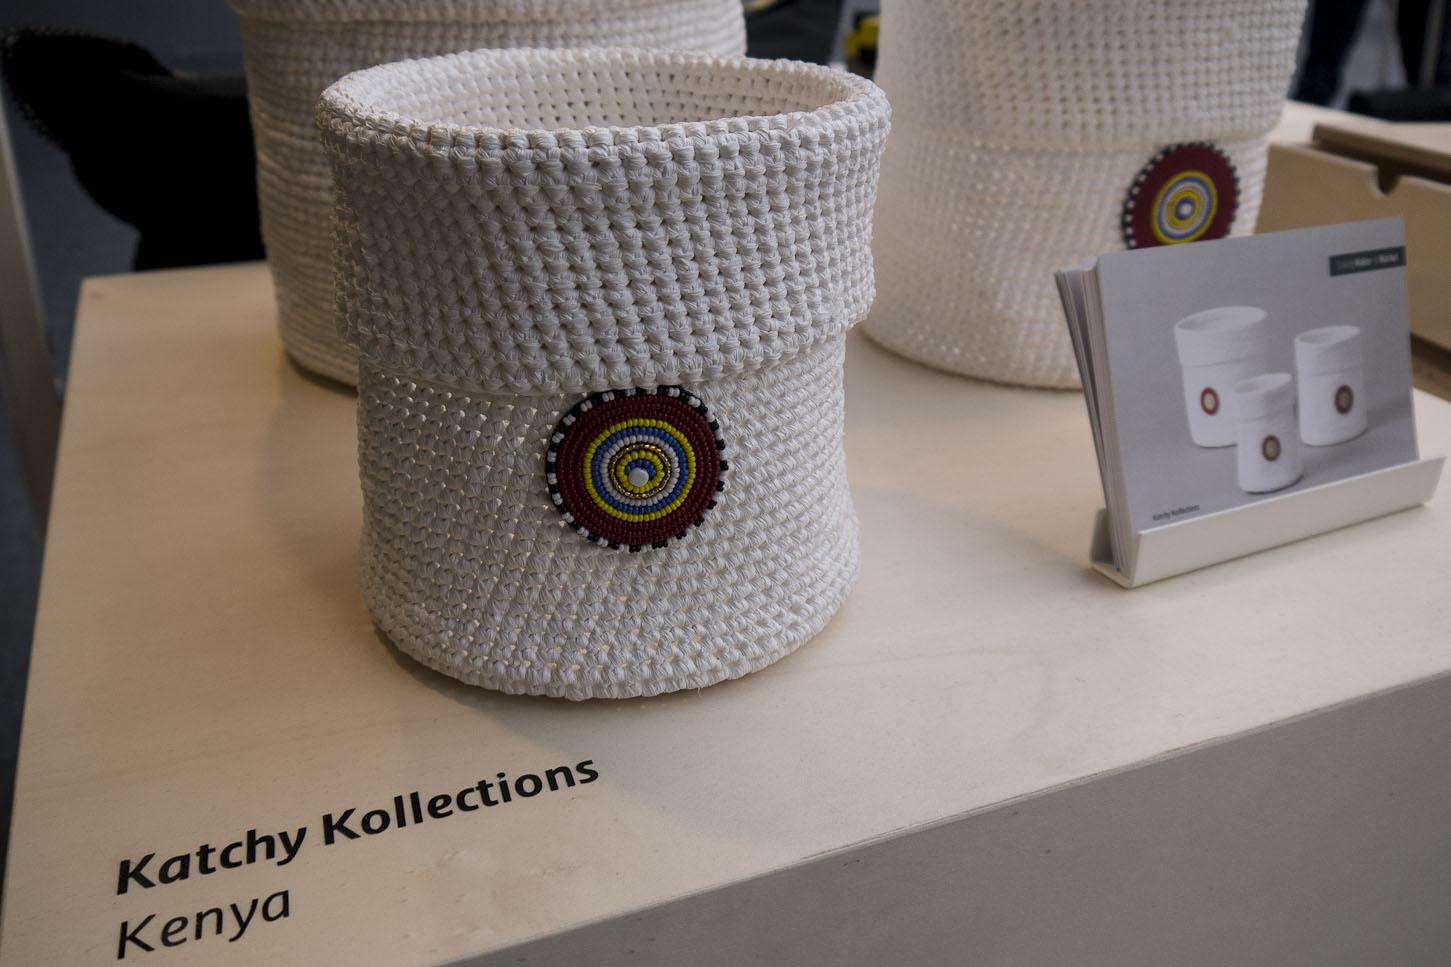 Katchy Kollections Kenya - Linking Maker & Market